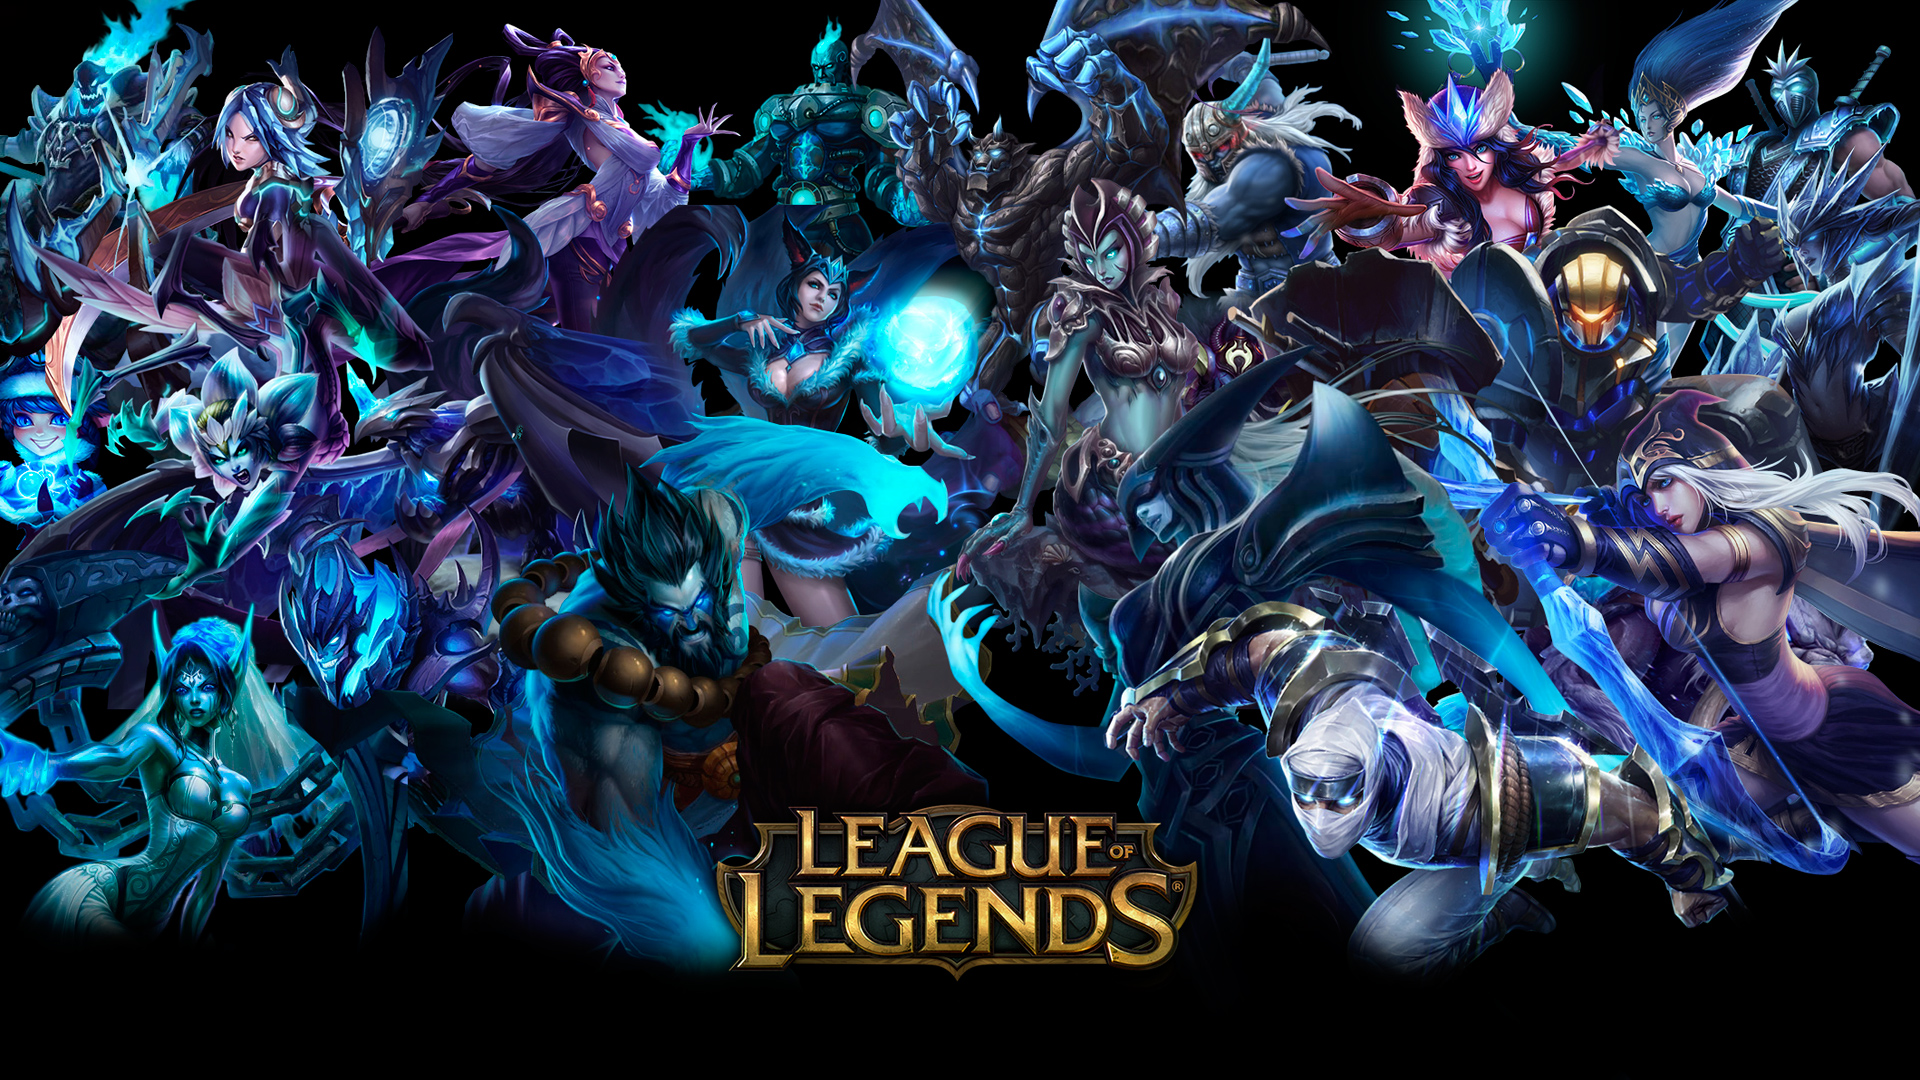 League Of Legends Hd Wallpaper League Of Legends Wallpaper